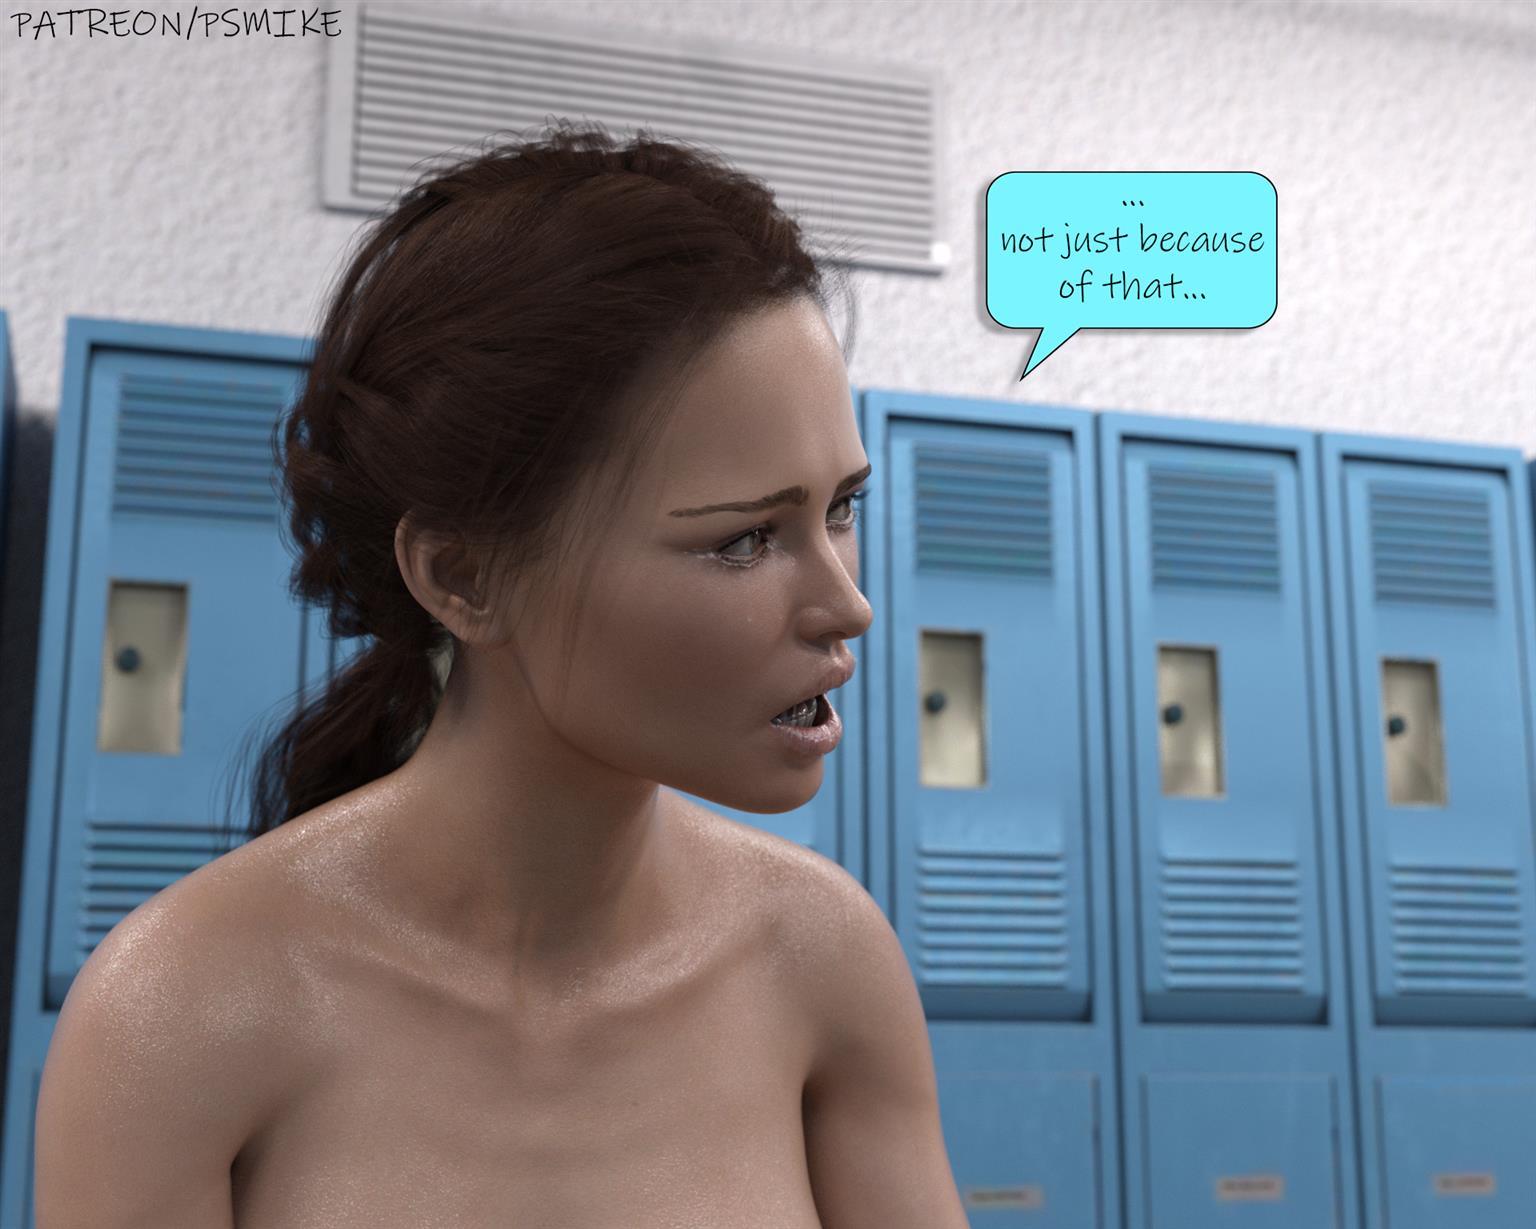 Locker Room Story [psmike] - Foto 74